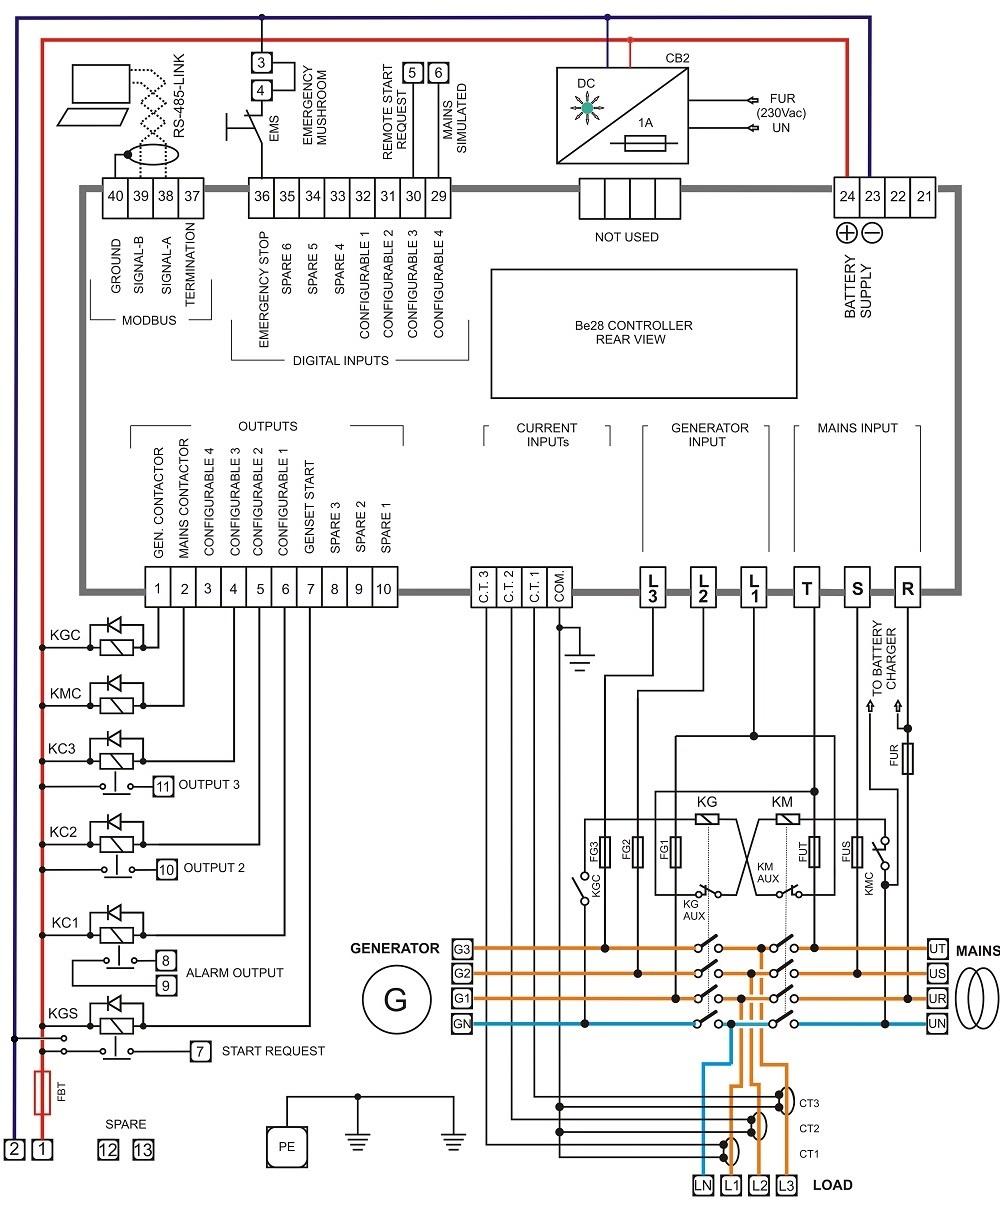 Outstanding Wiring Moreover Plc Control Panel Wiring Diagram Motor Control Wiring Cloud Rometaidewilluminateatxorg